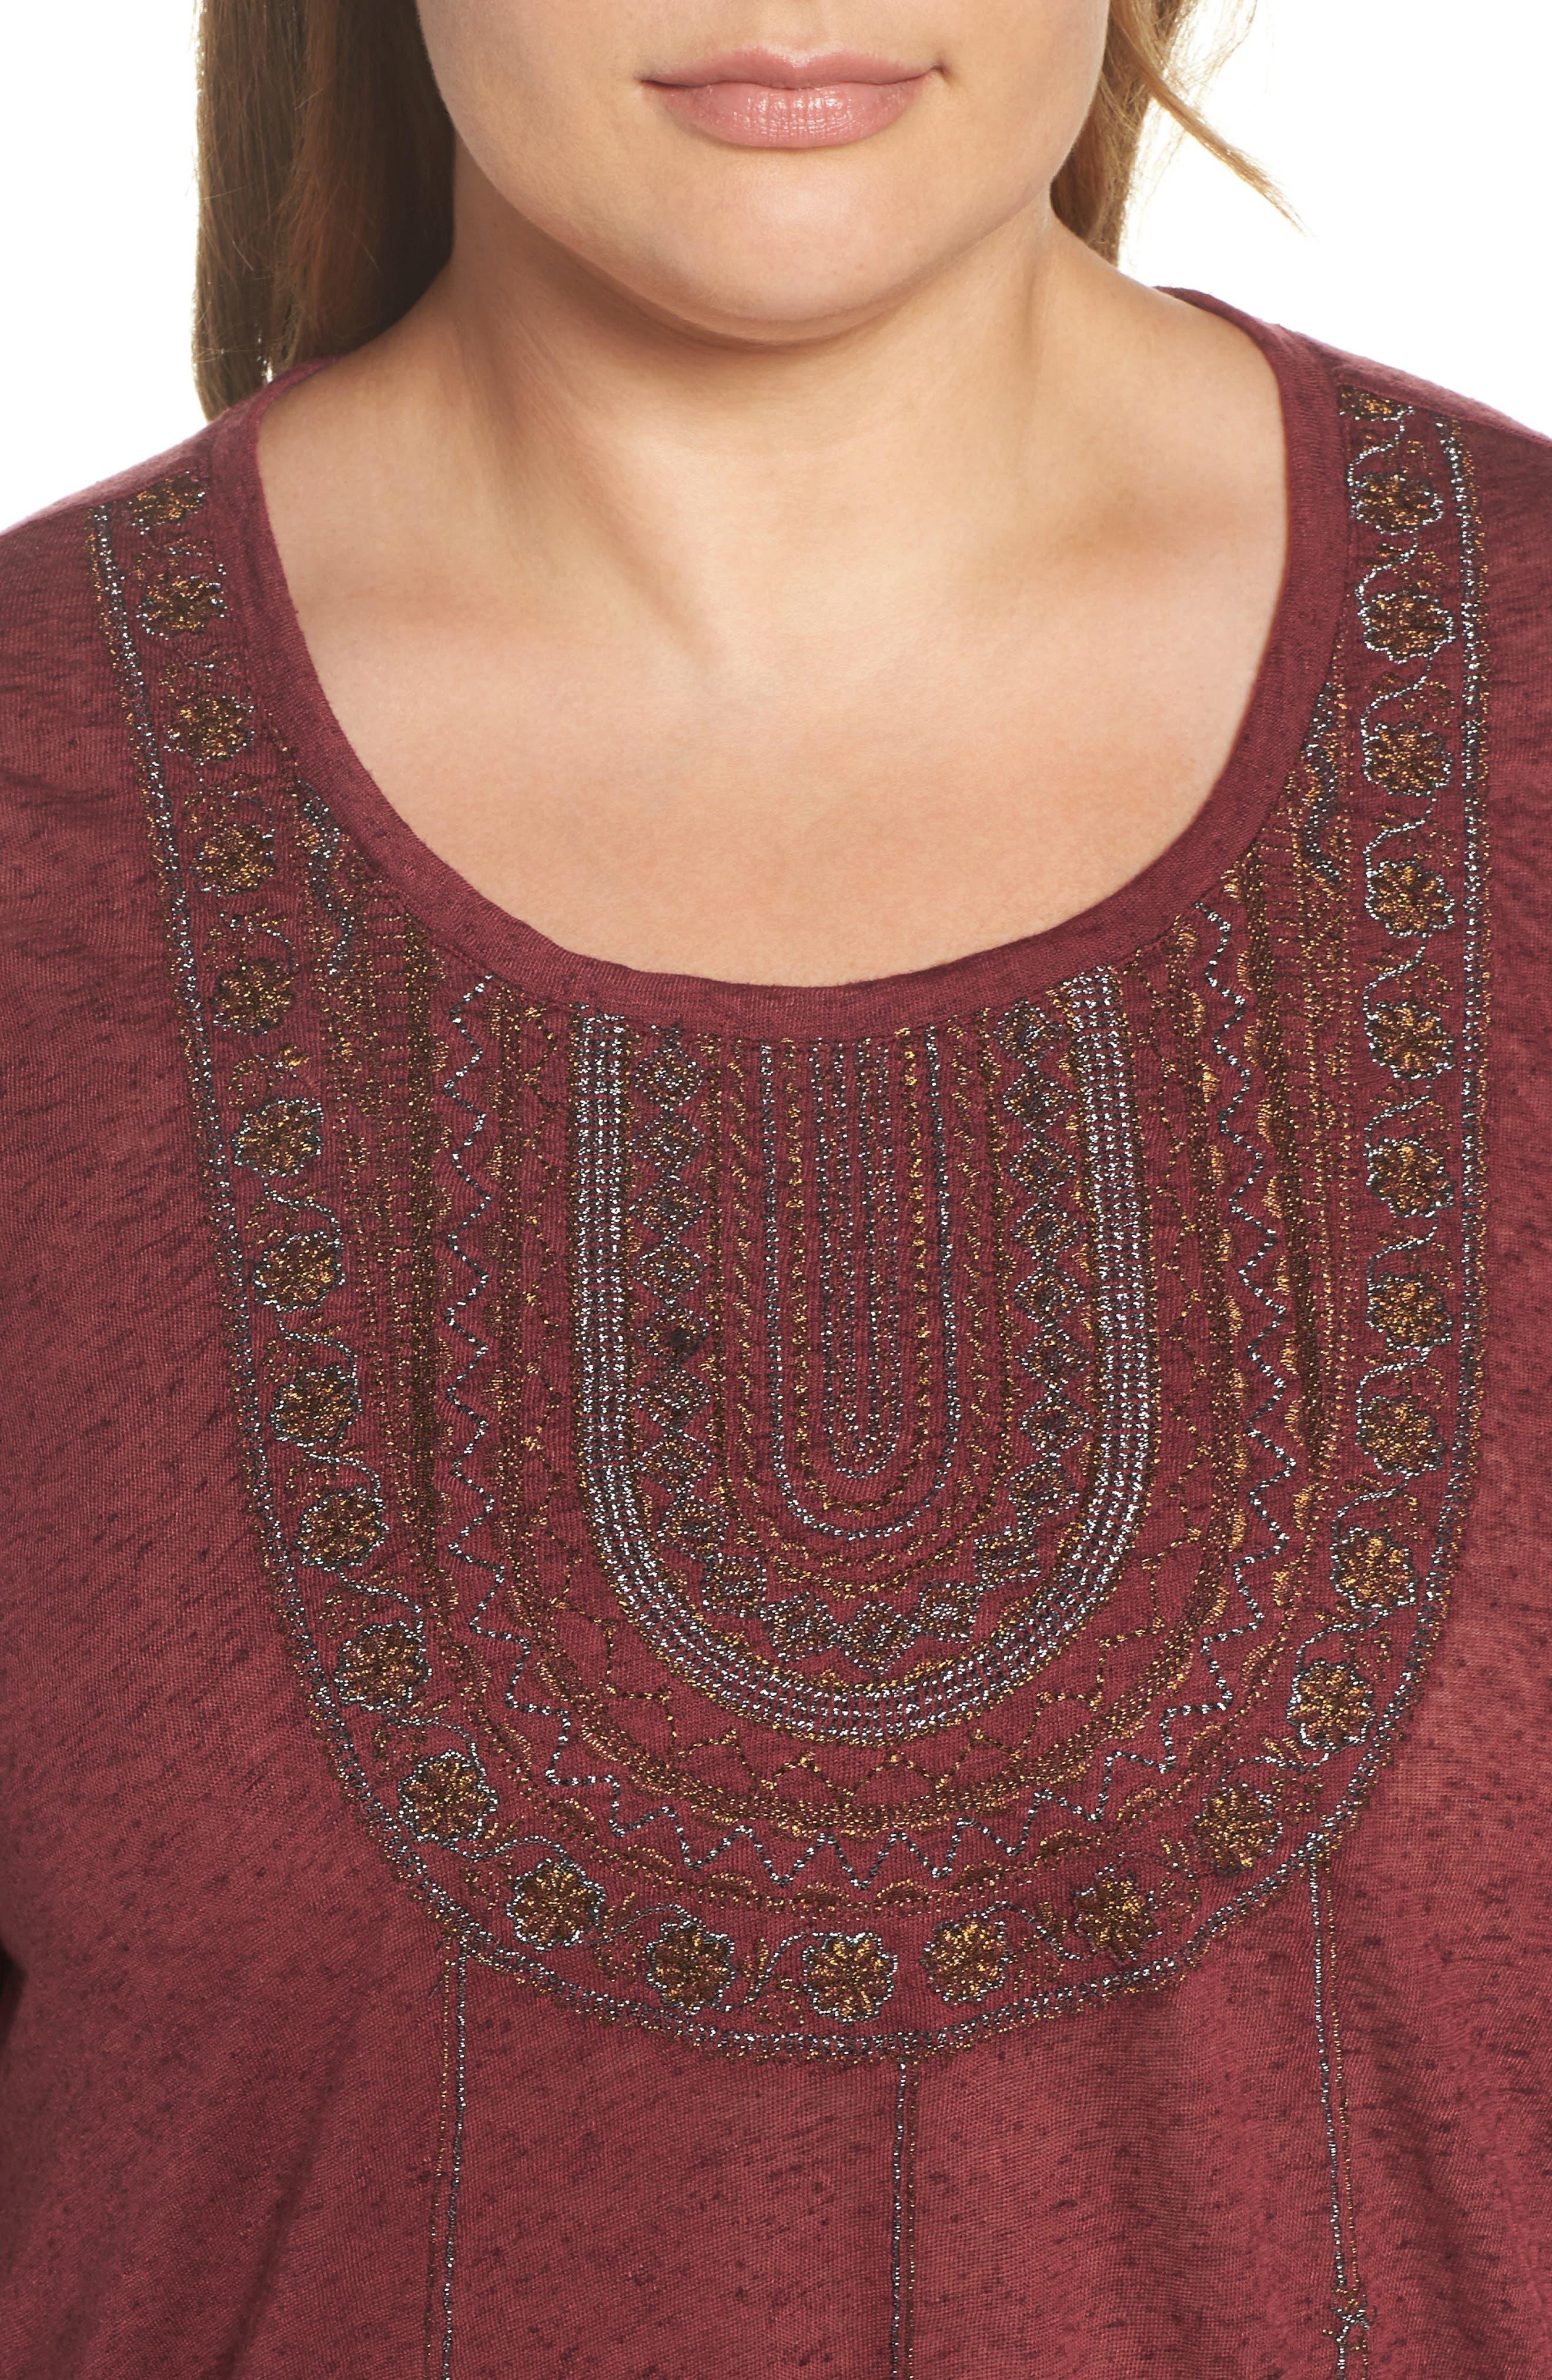 Embroidered Bib Top,                             Alternate thumbnail 4, color,                             Tawny Port